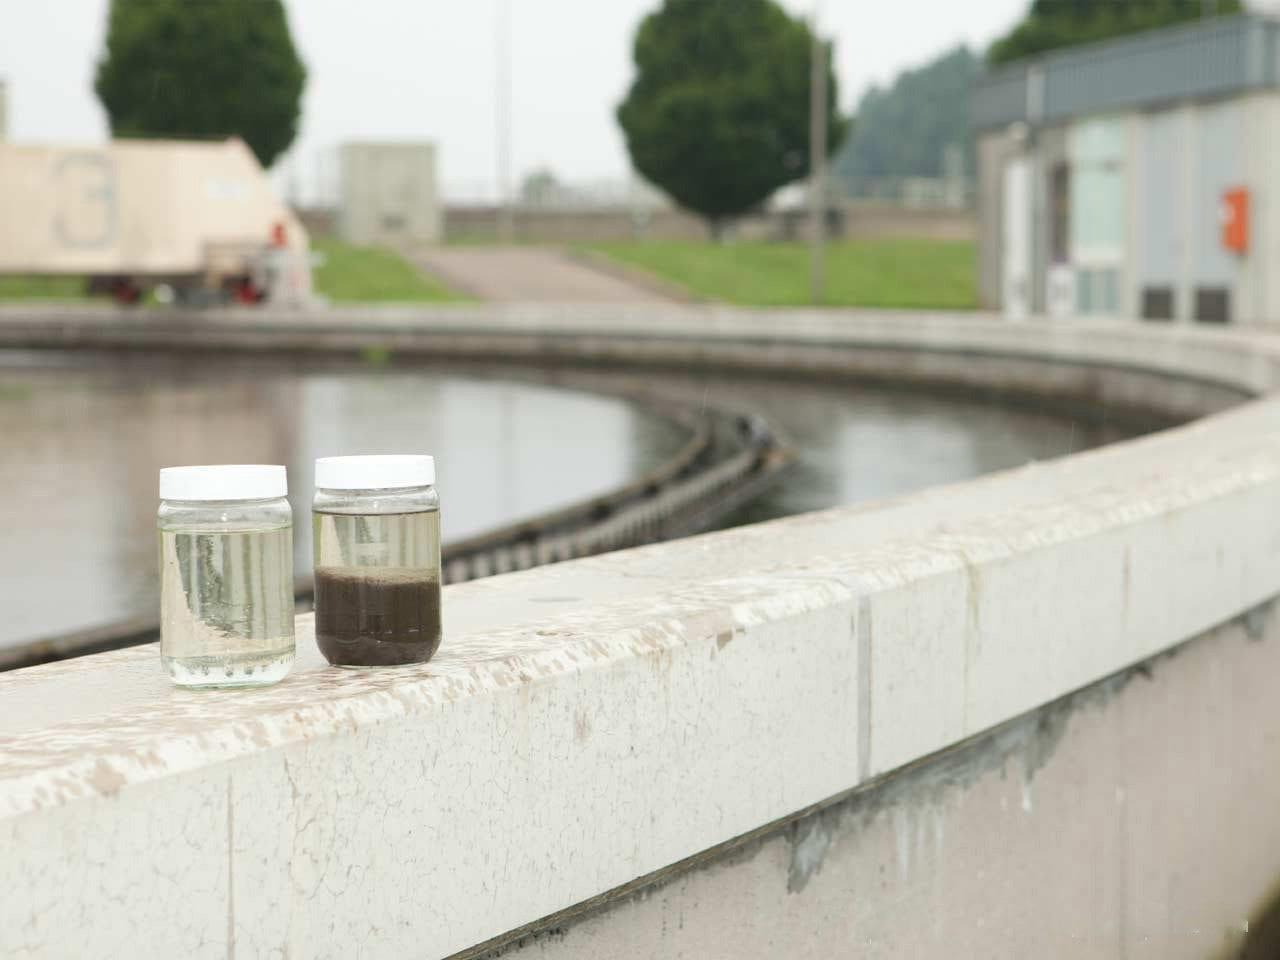 Biologische Abwasserbehandlung DAS EE